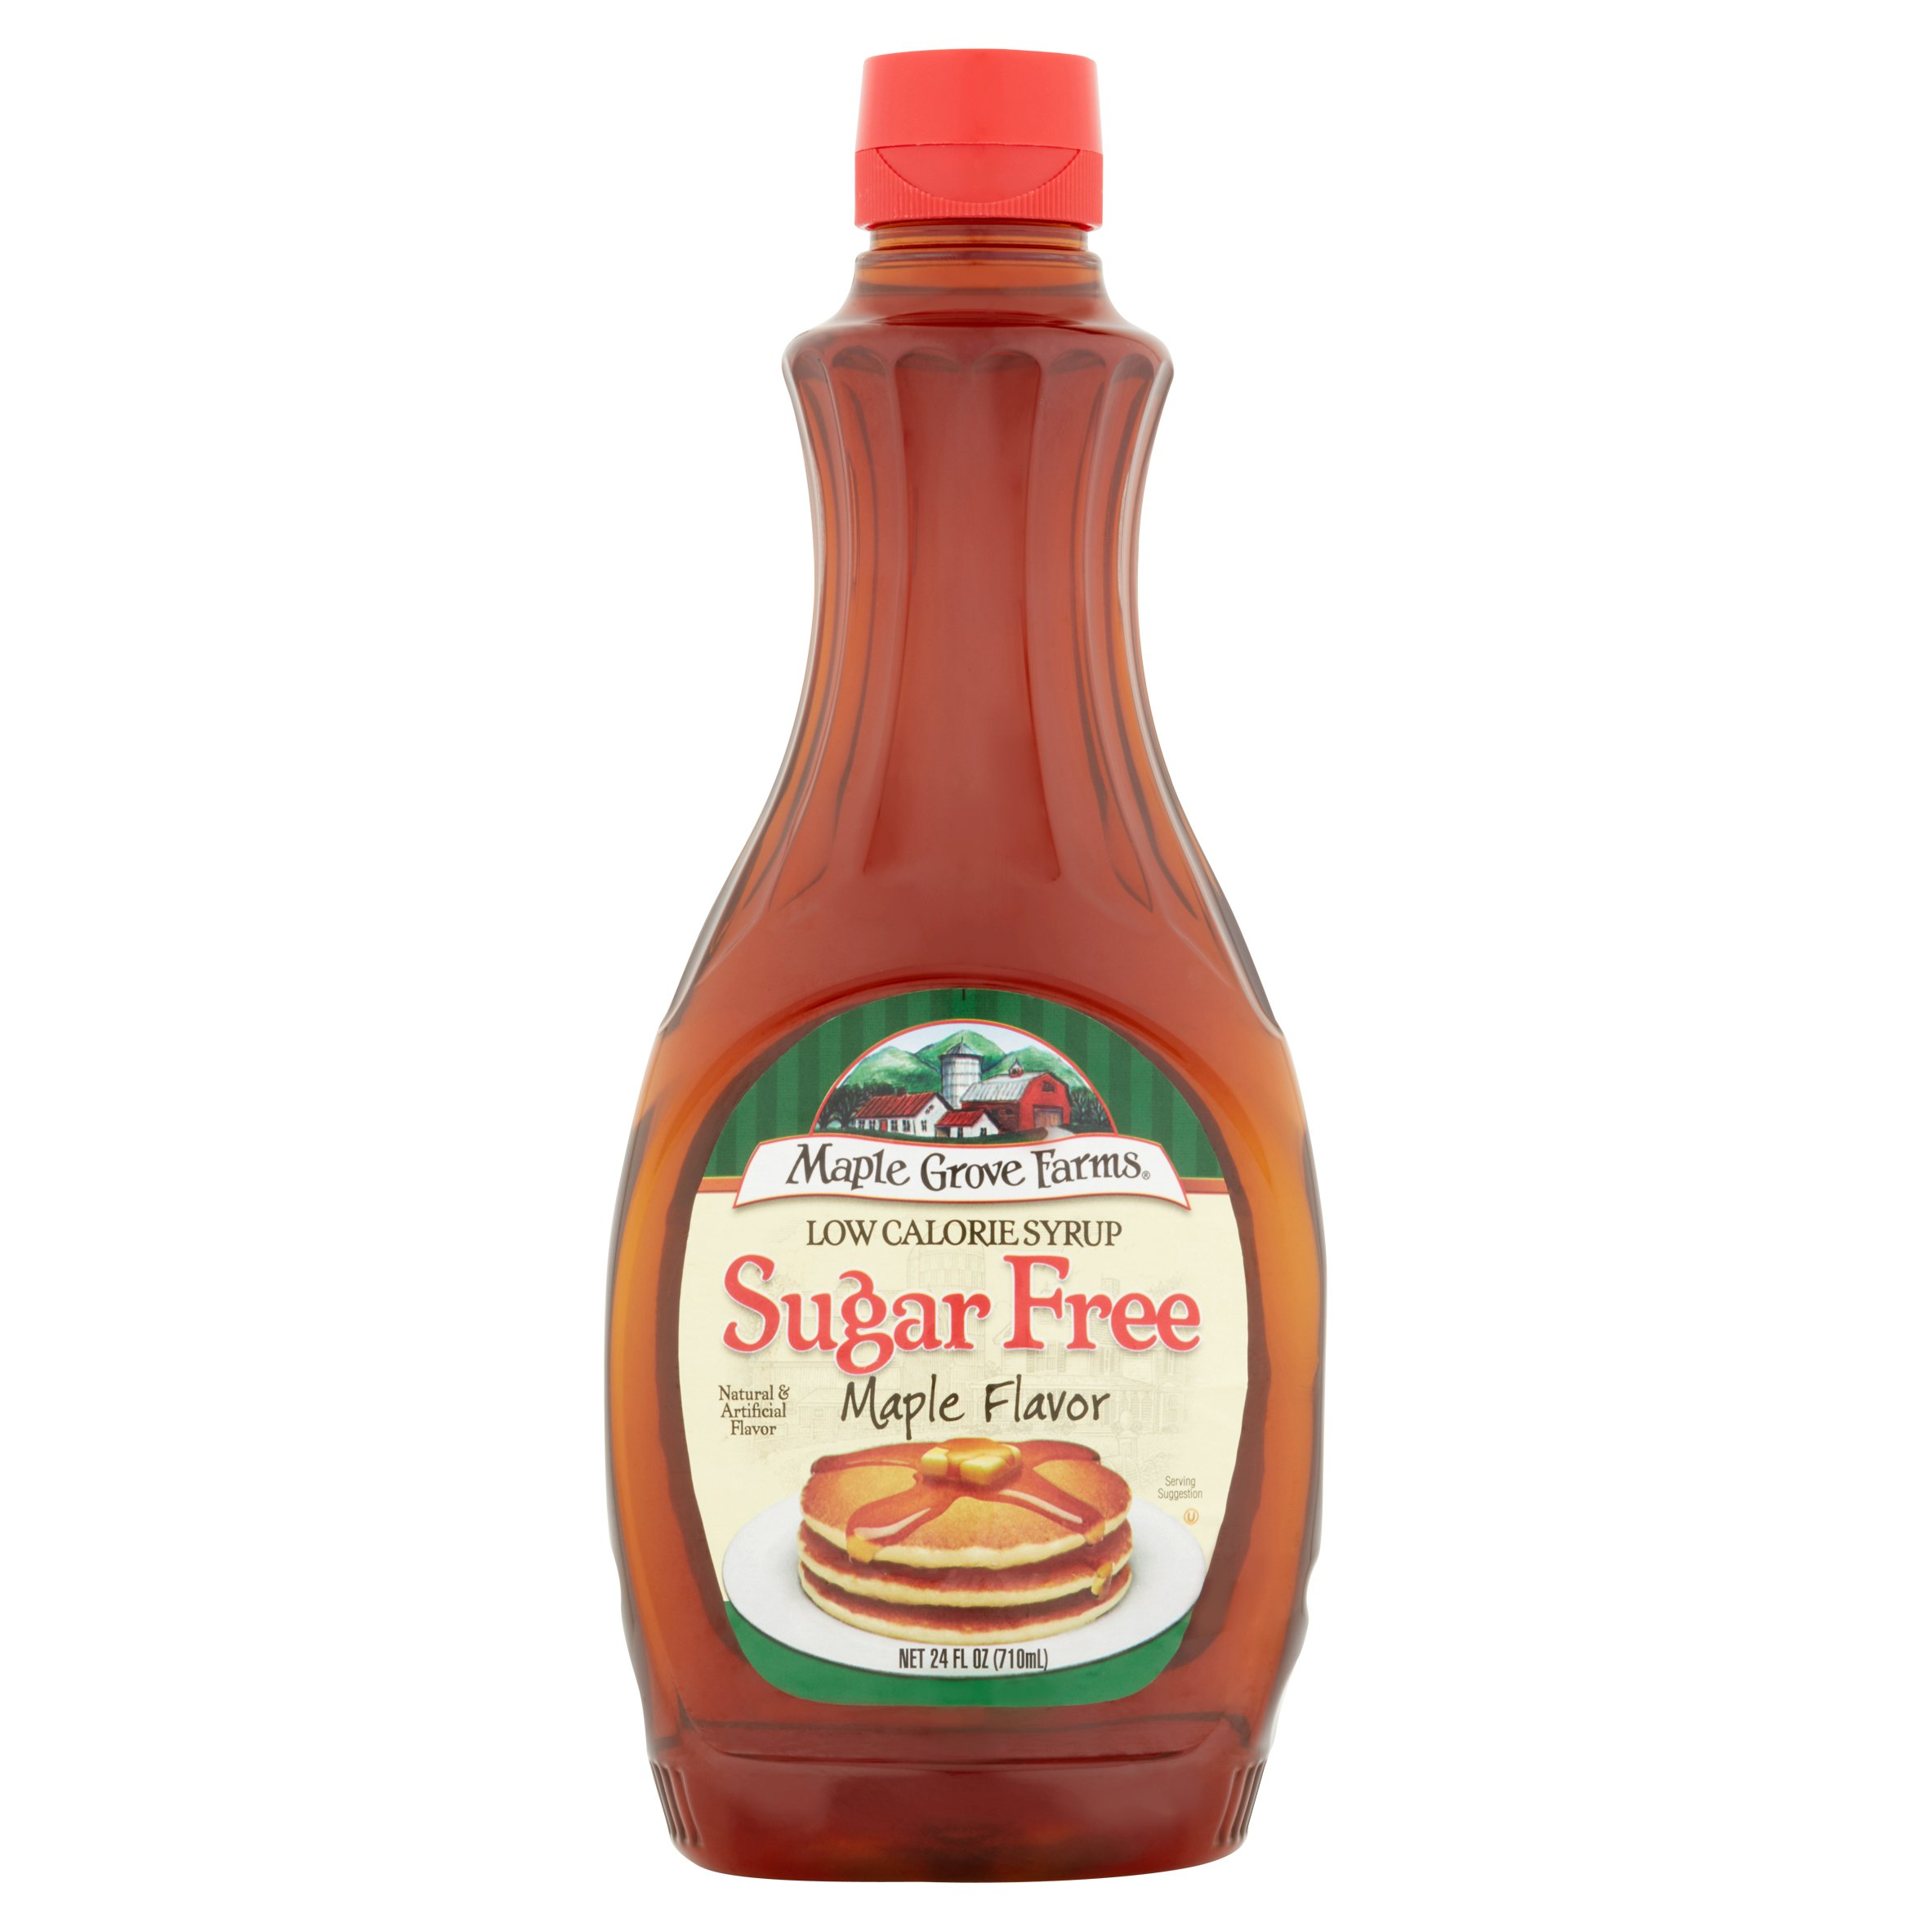 Maple Grove Farms Sugar Free Low Calorie Maple Flavor